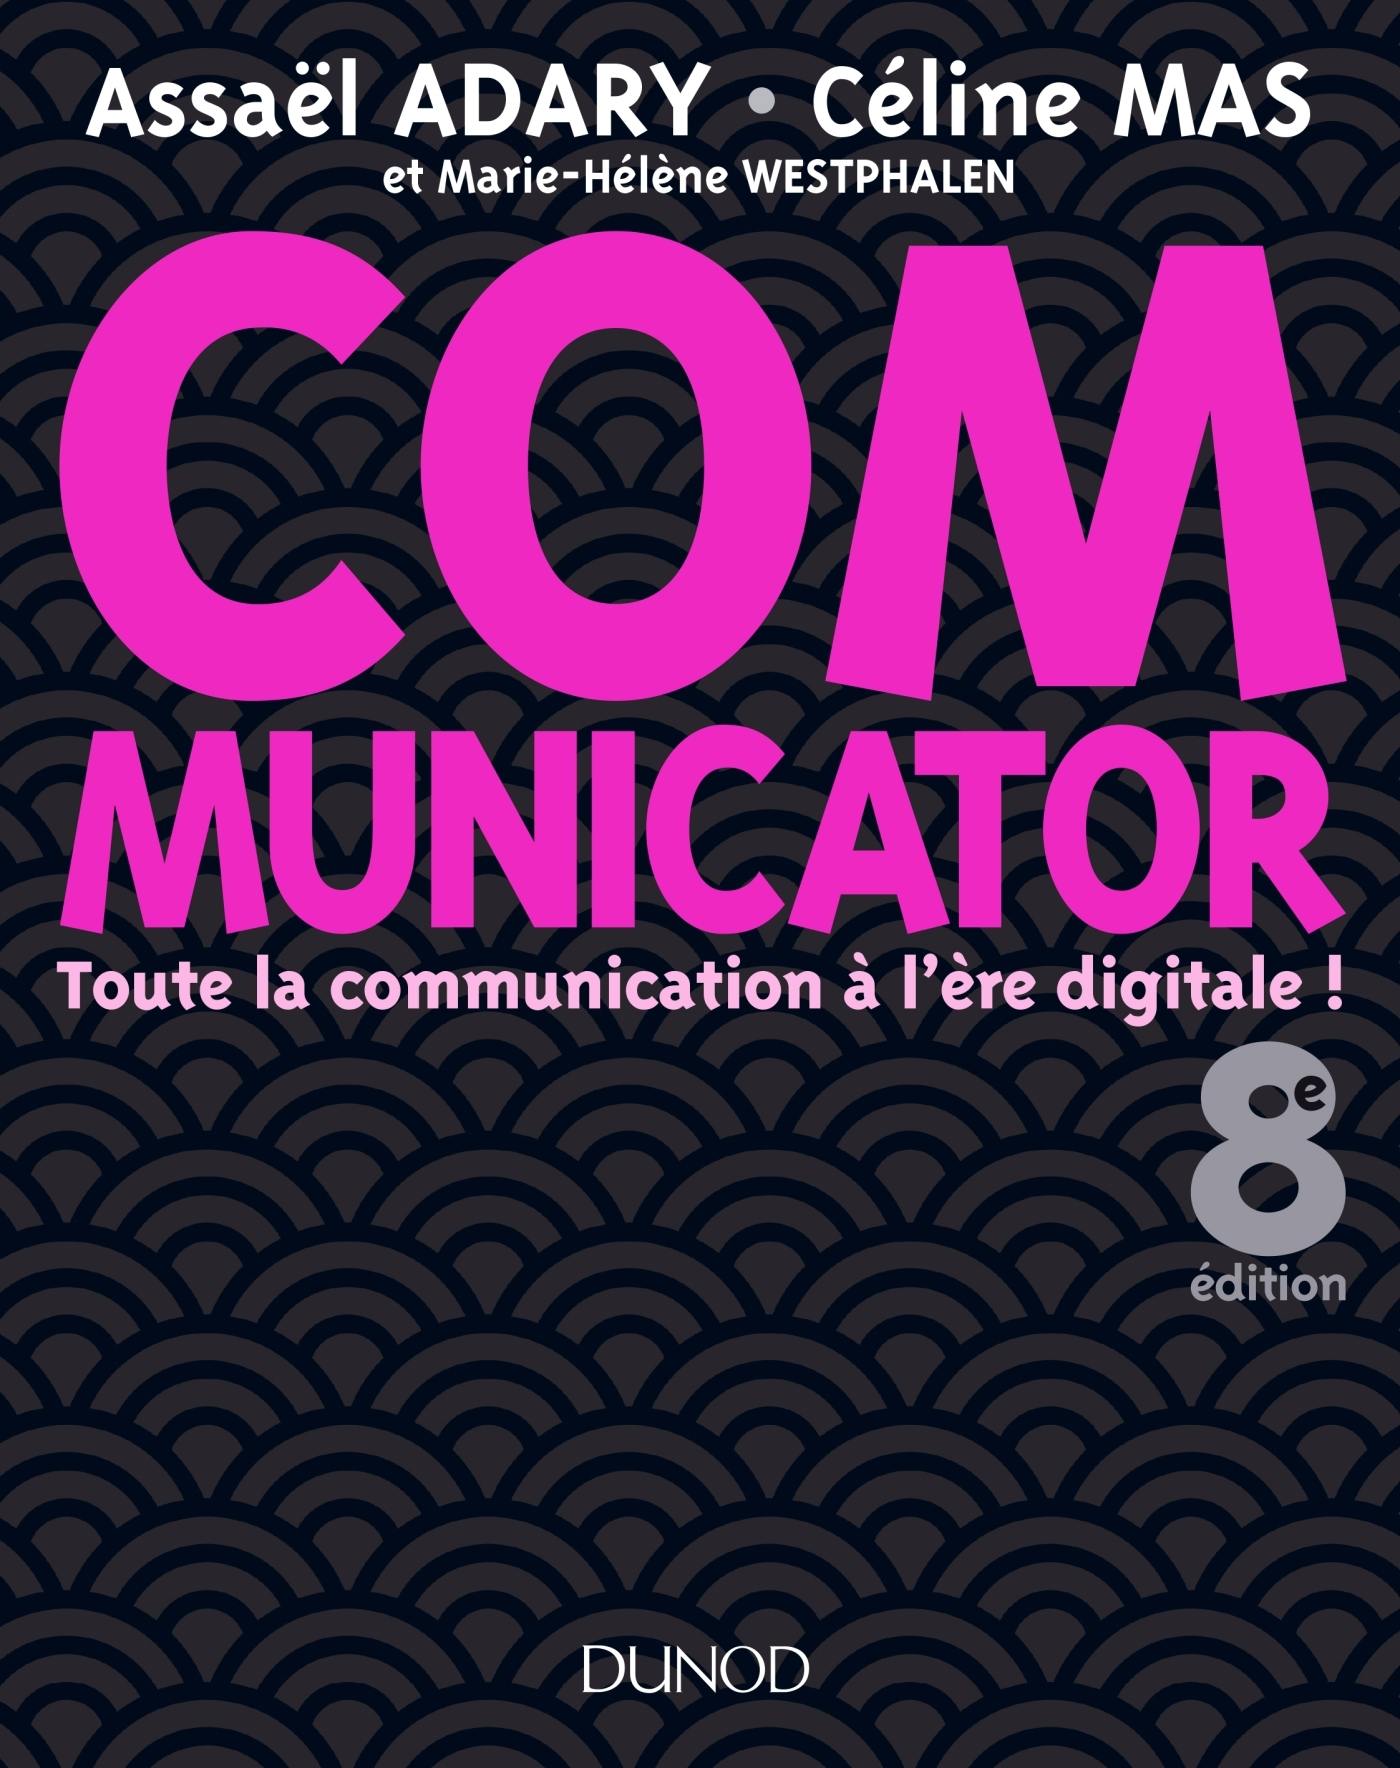 COMMUNICATOR - 8E ED. - TOUTE LA COMMUNICATION A L'ERE DIGITALE !